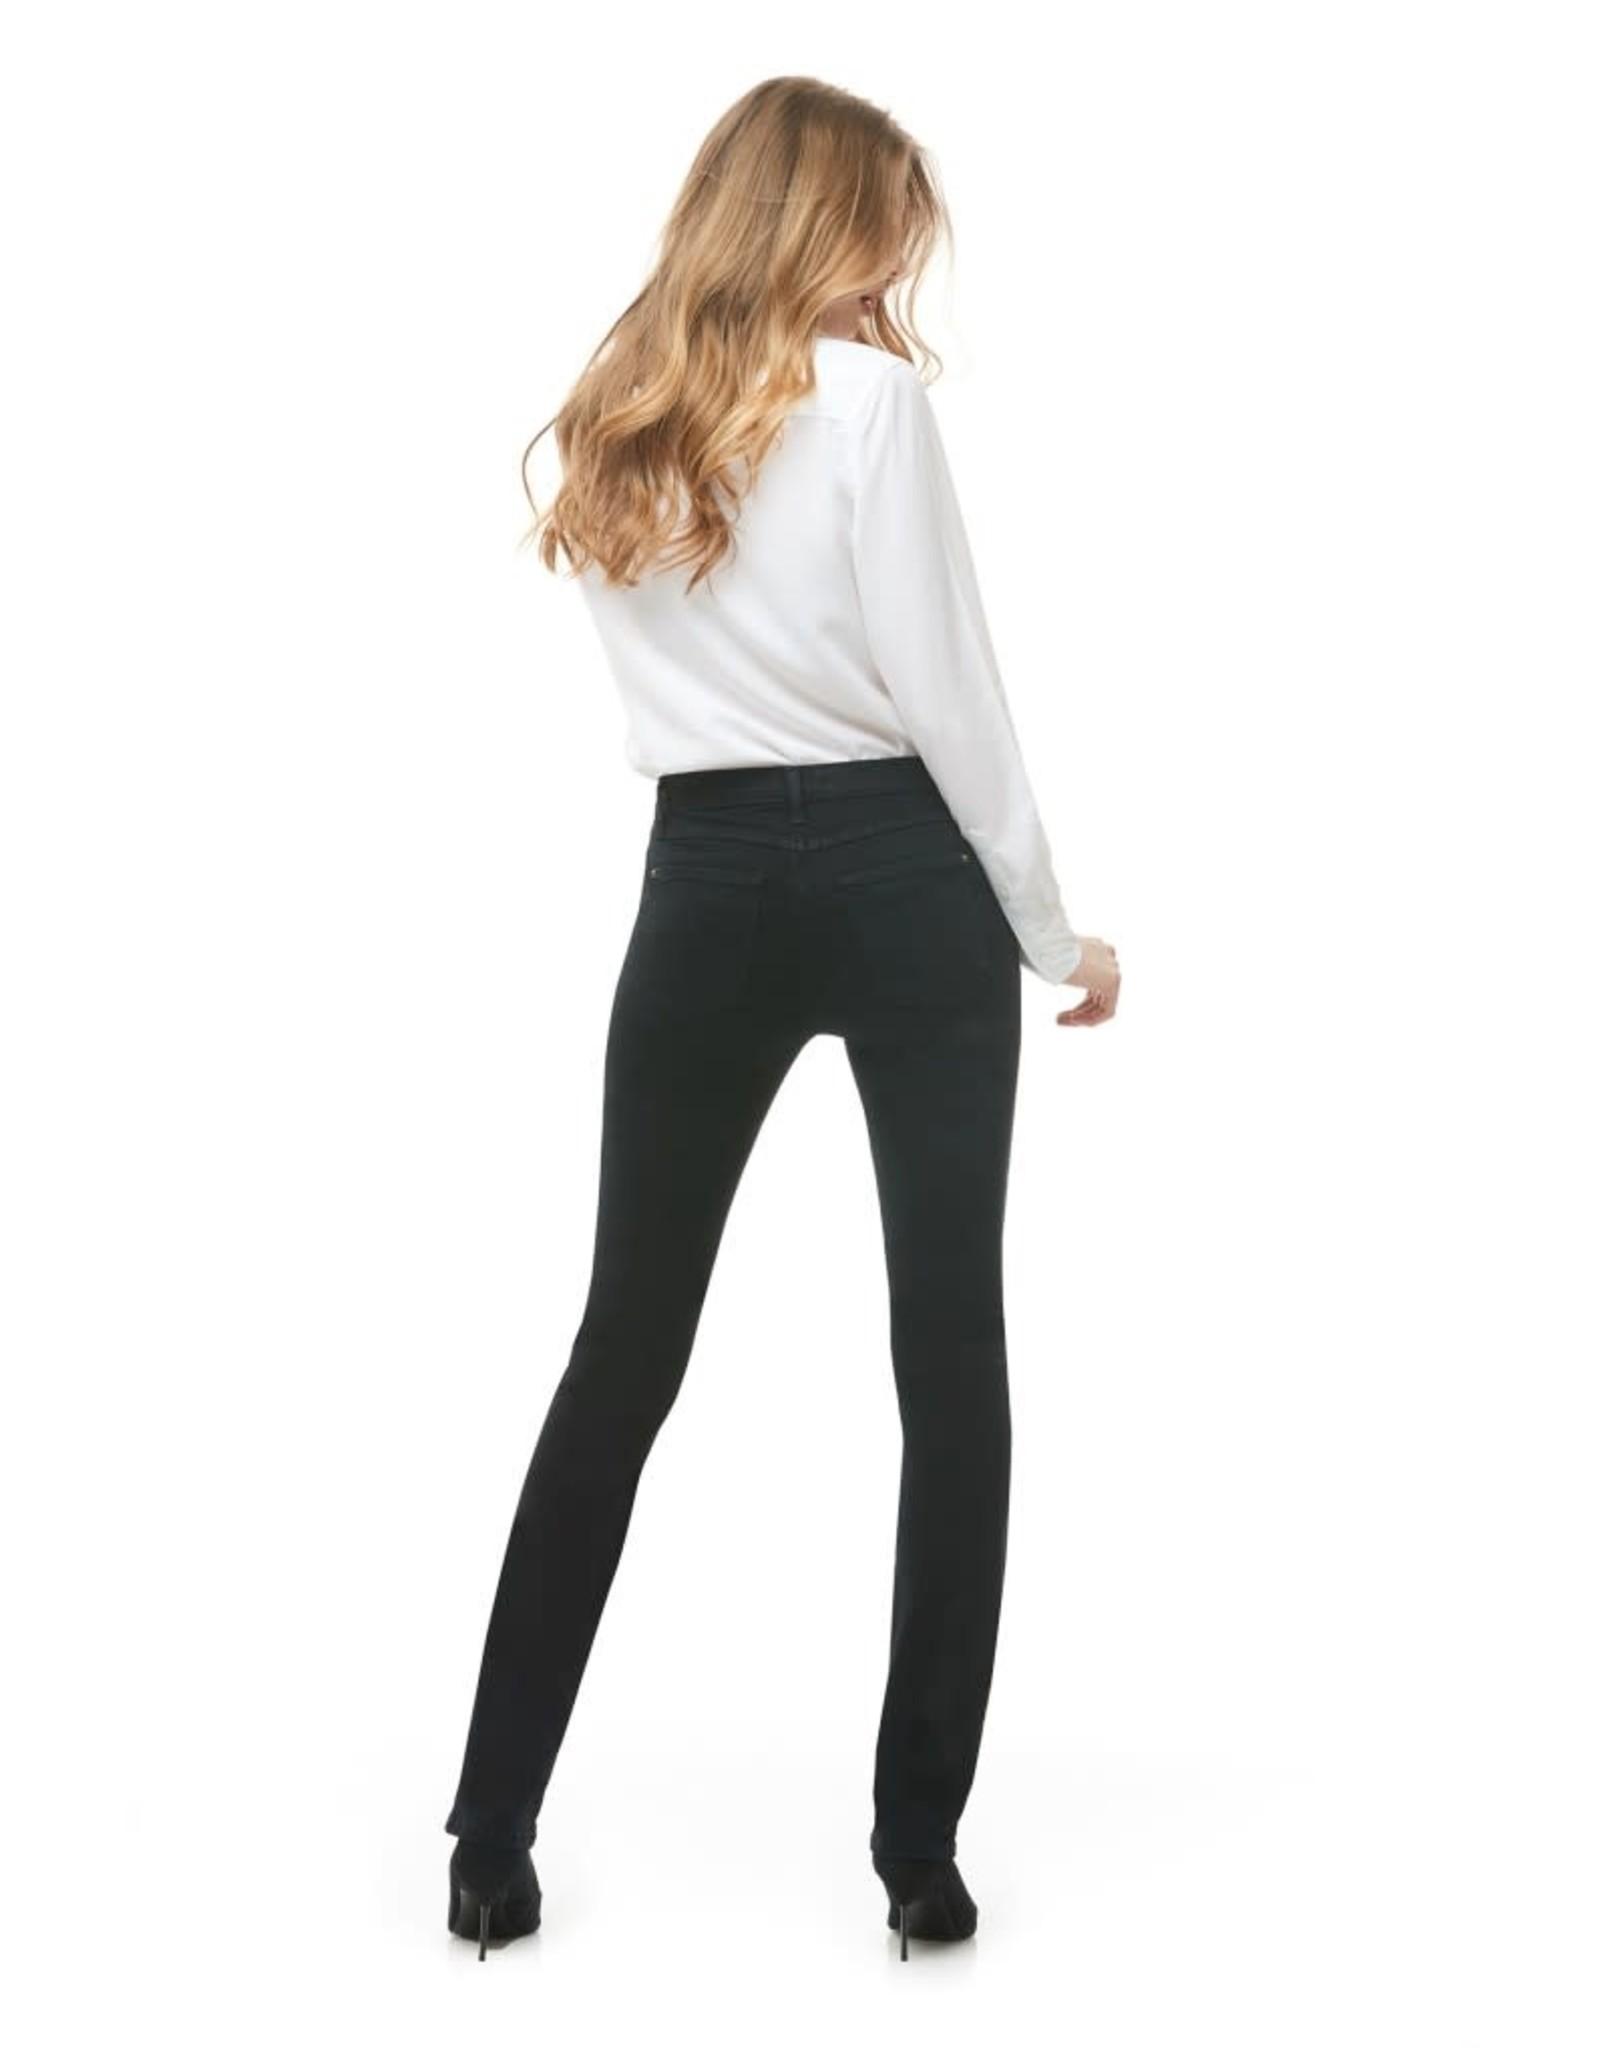 Yoga Jeans High Rise Slim 1623 Pitch black Yoga Jeans